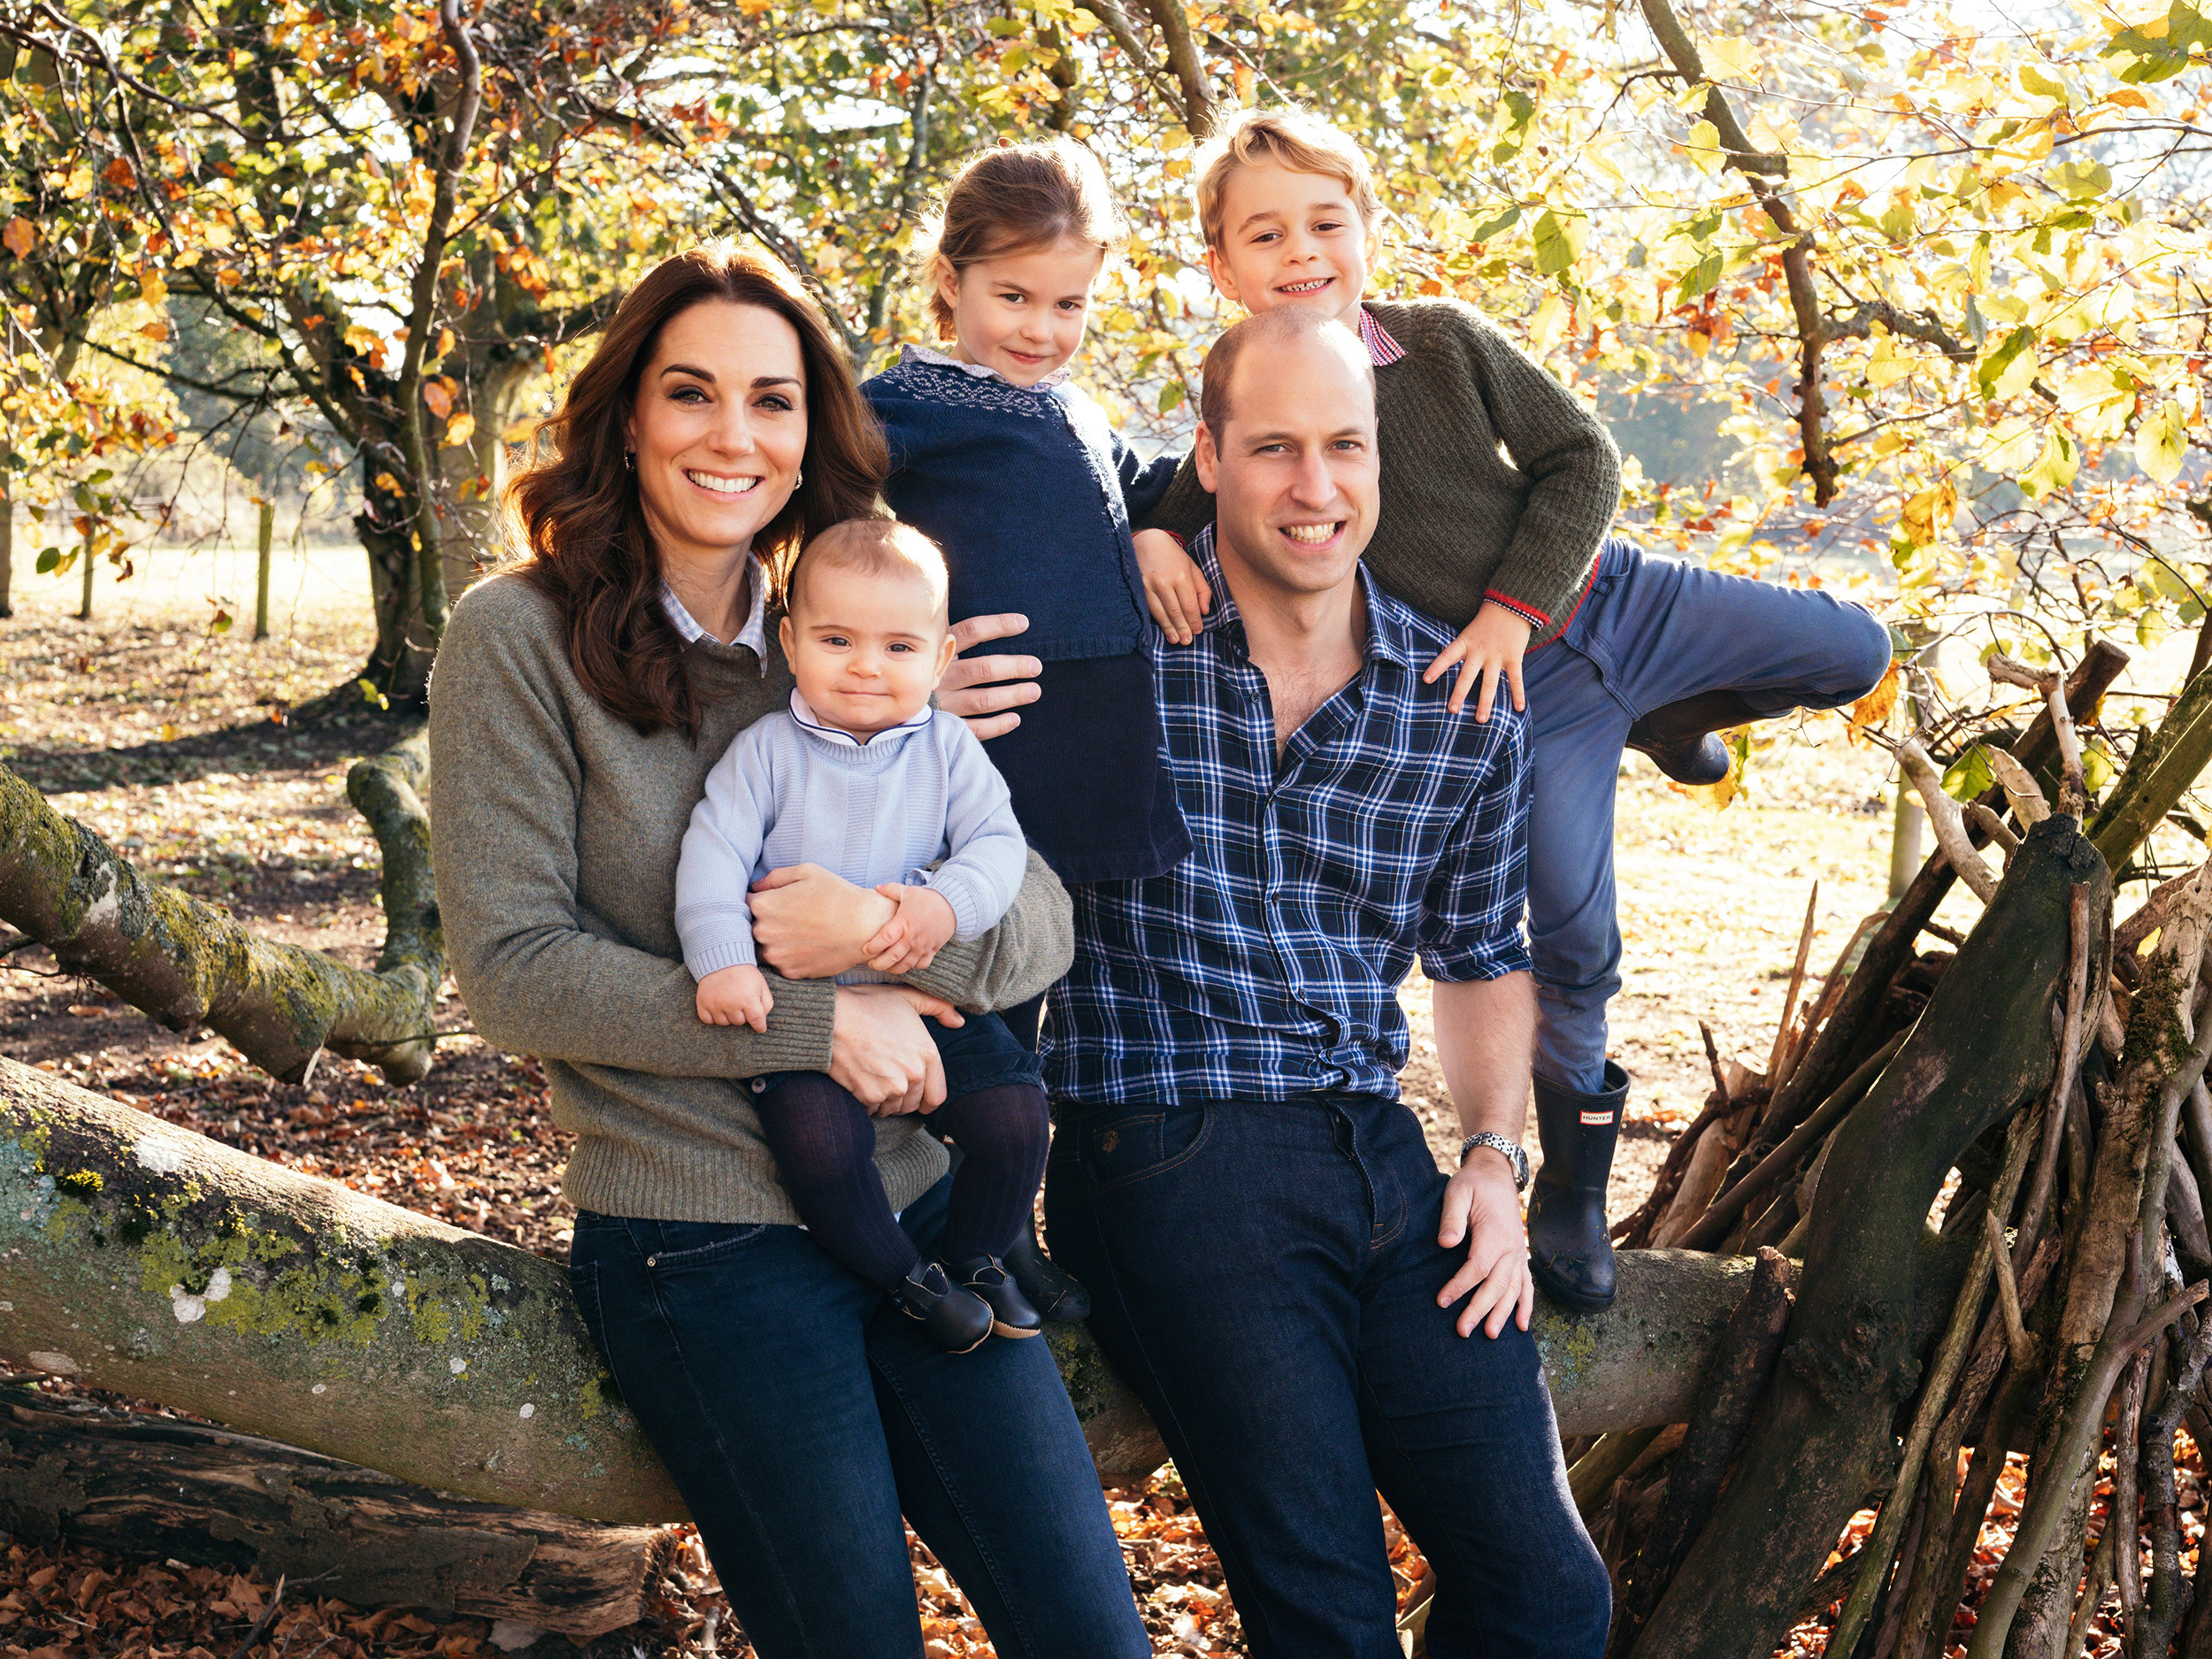 Brit Royal Christmas Cards 2020 Royal family releases their 2018 Christmas card photos